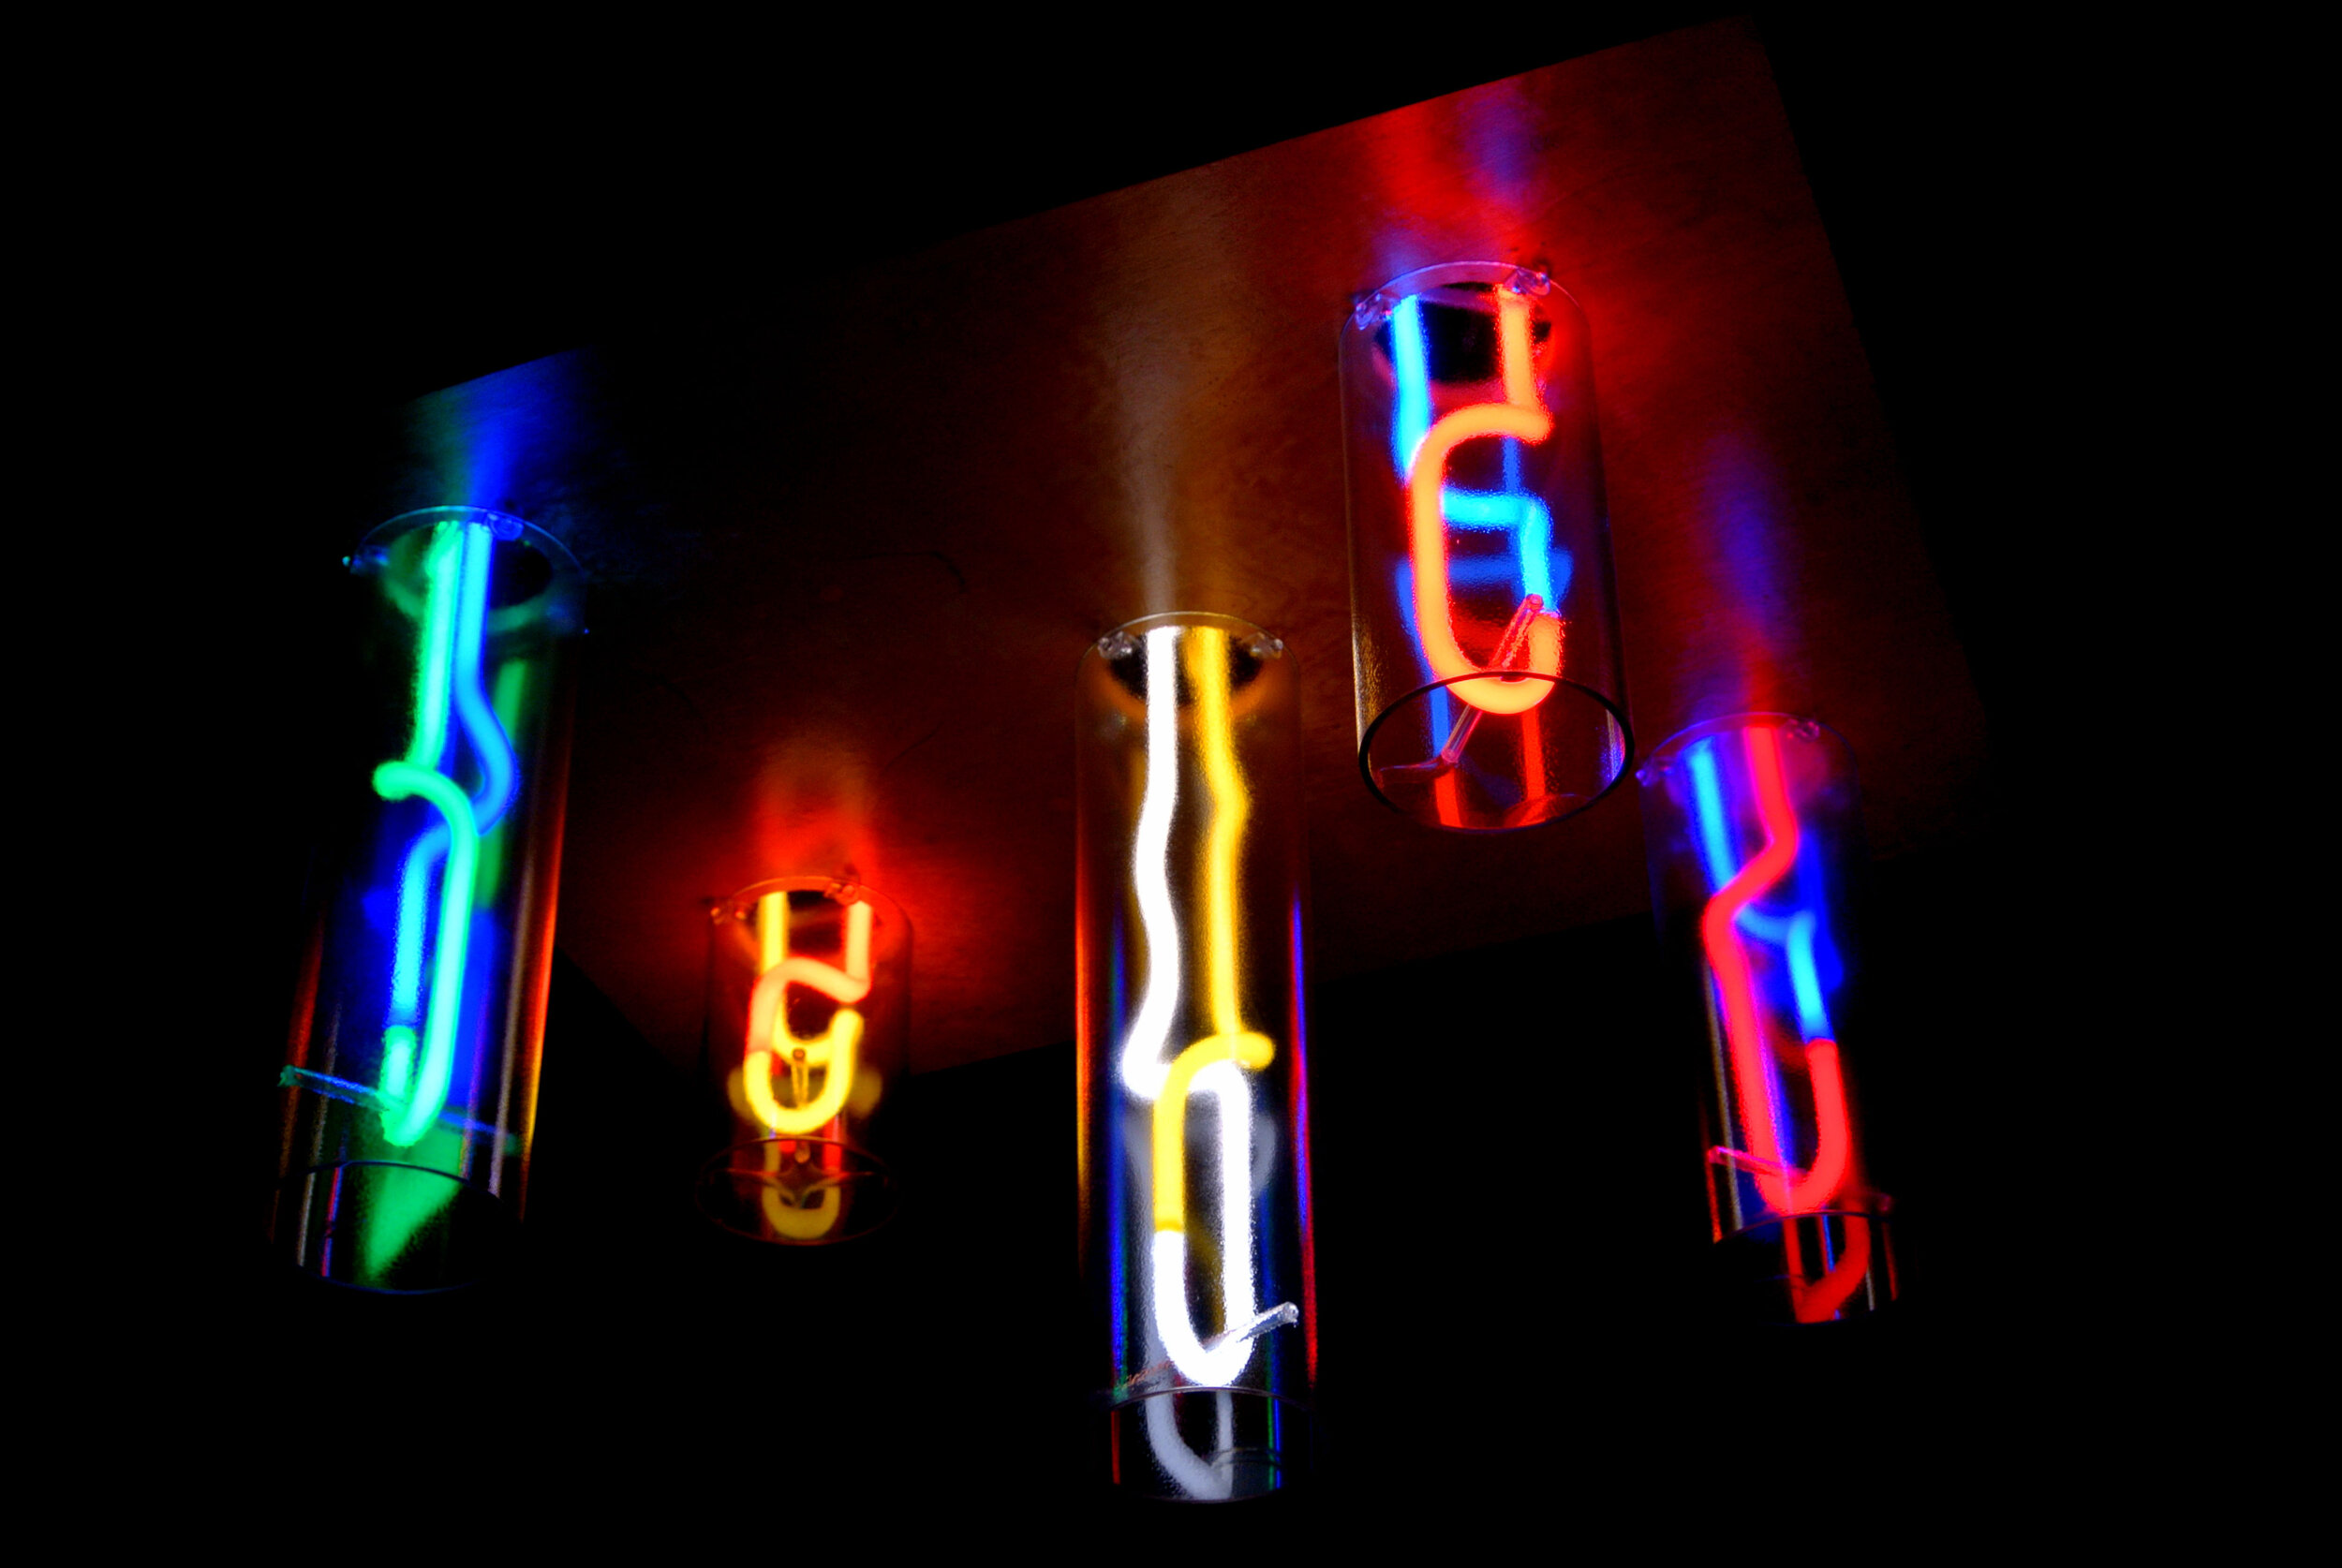 """ITALIAN CAVE ICICLES"" NEON CHANDELIER LIGHT FIXTURE by John Barton - BartonNeonMagic.com"